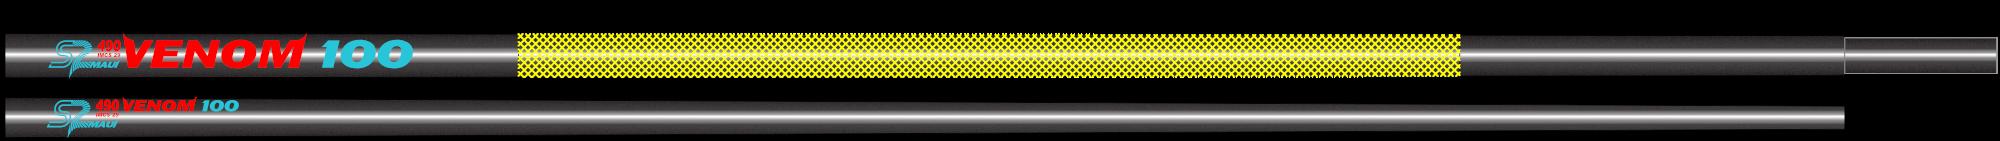 S2 Maui Venom Race 100 Mast (2020)